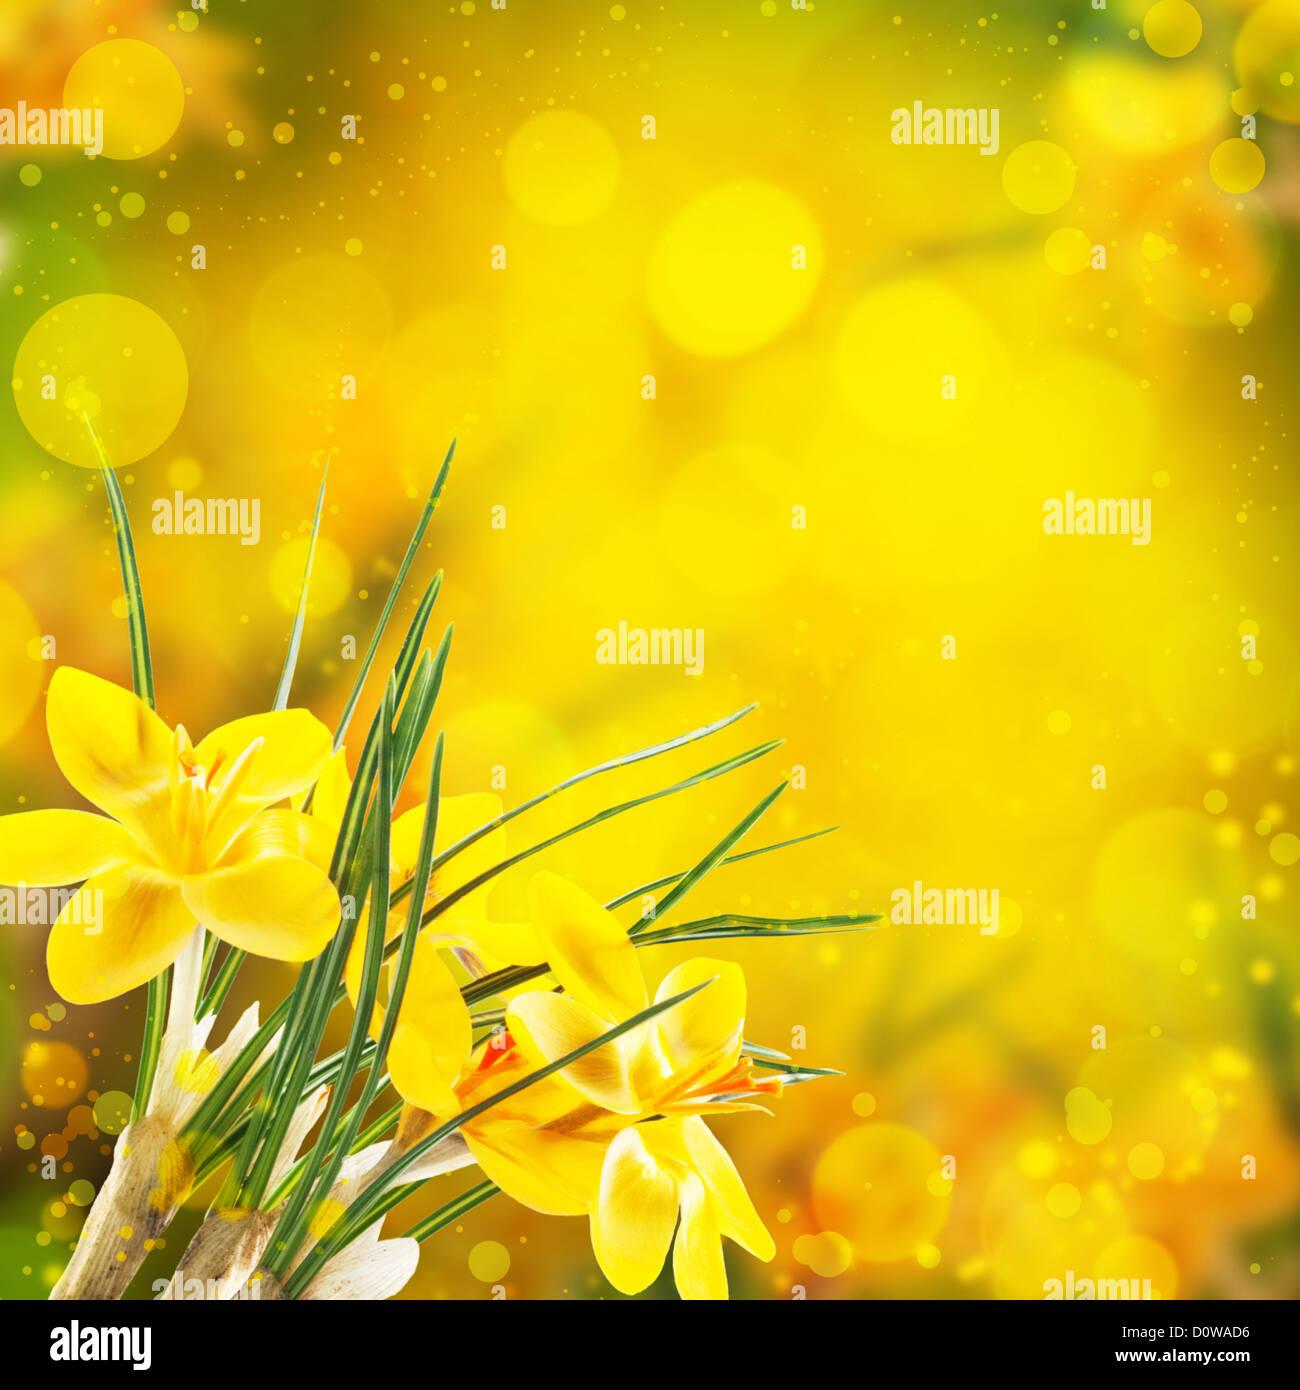 Yellow Crocus Flowers Wallpaper Stock Photos Yellow Crocus Flowers